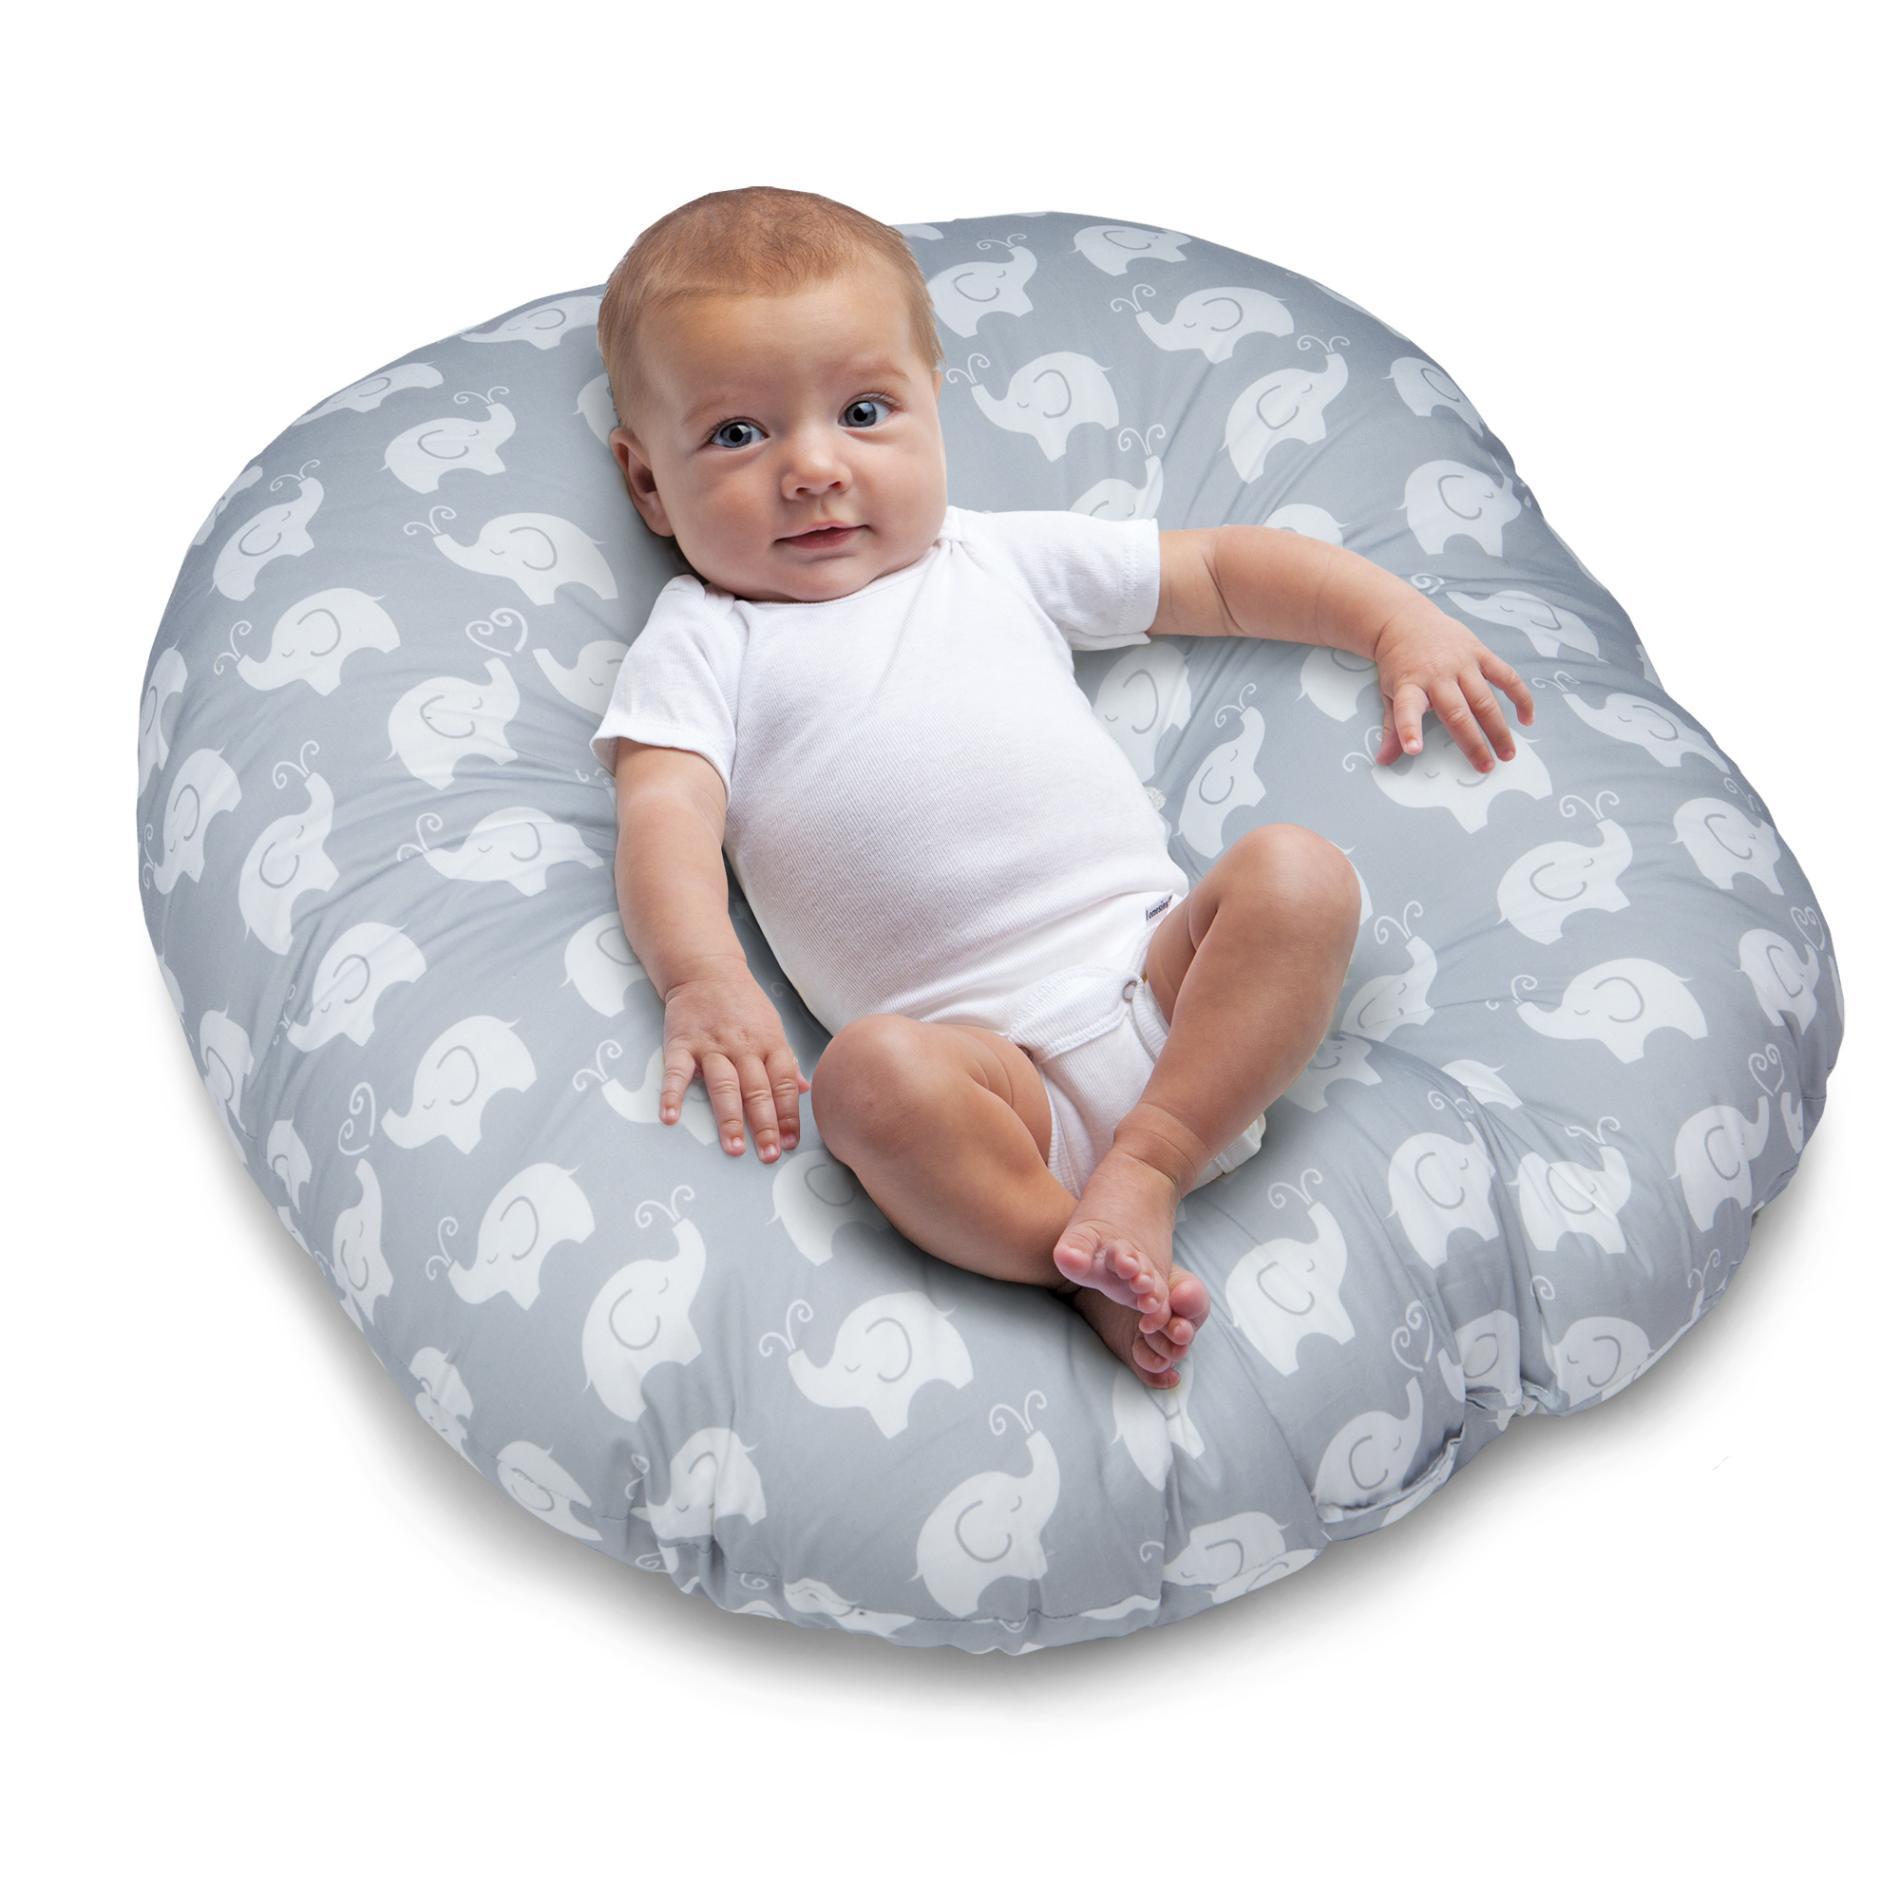 baby boppy chair recall burnt orange accent newborn lounger pillow elephants feeding alternate image